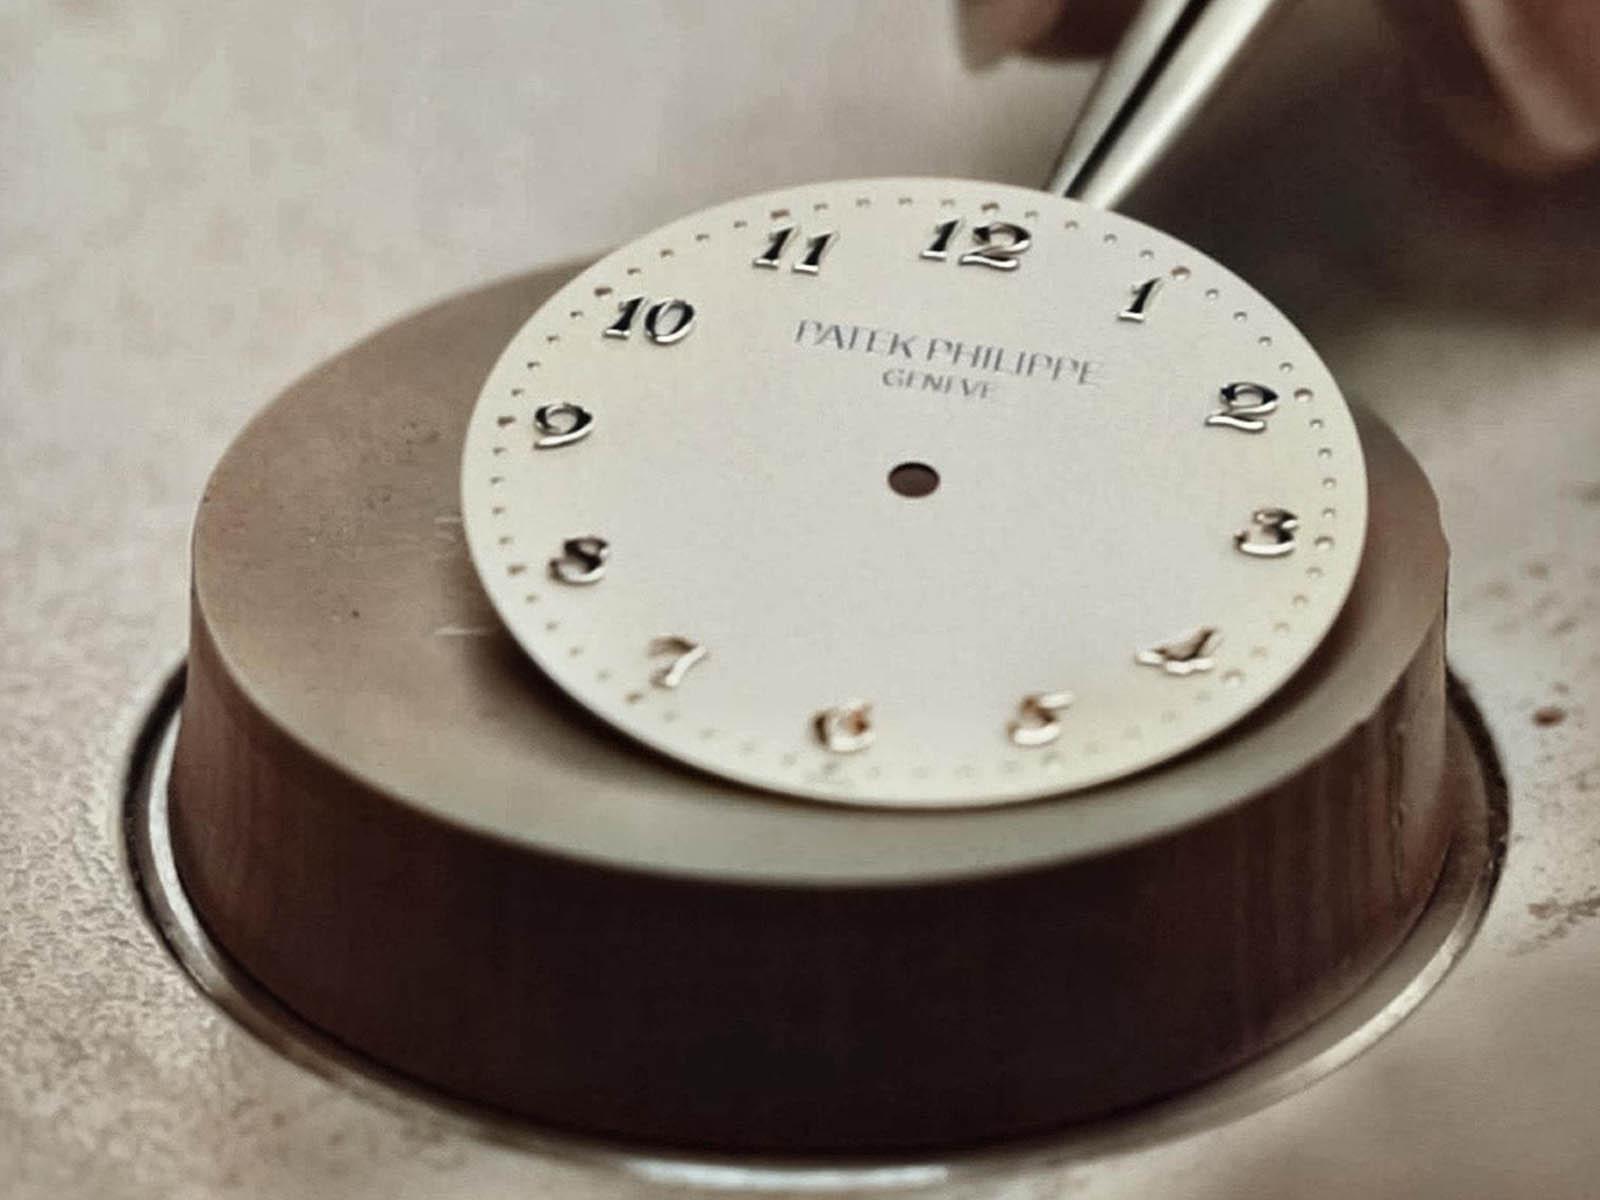 patek-philippe-dials-7.jpg